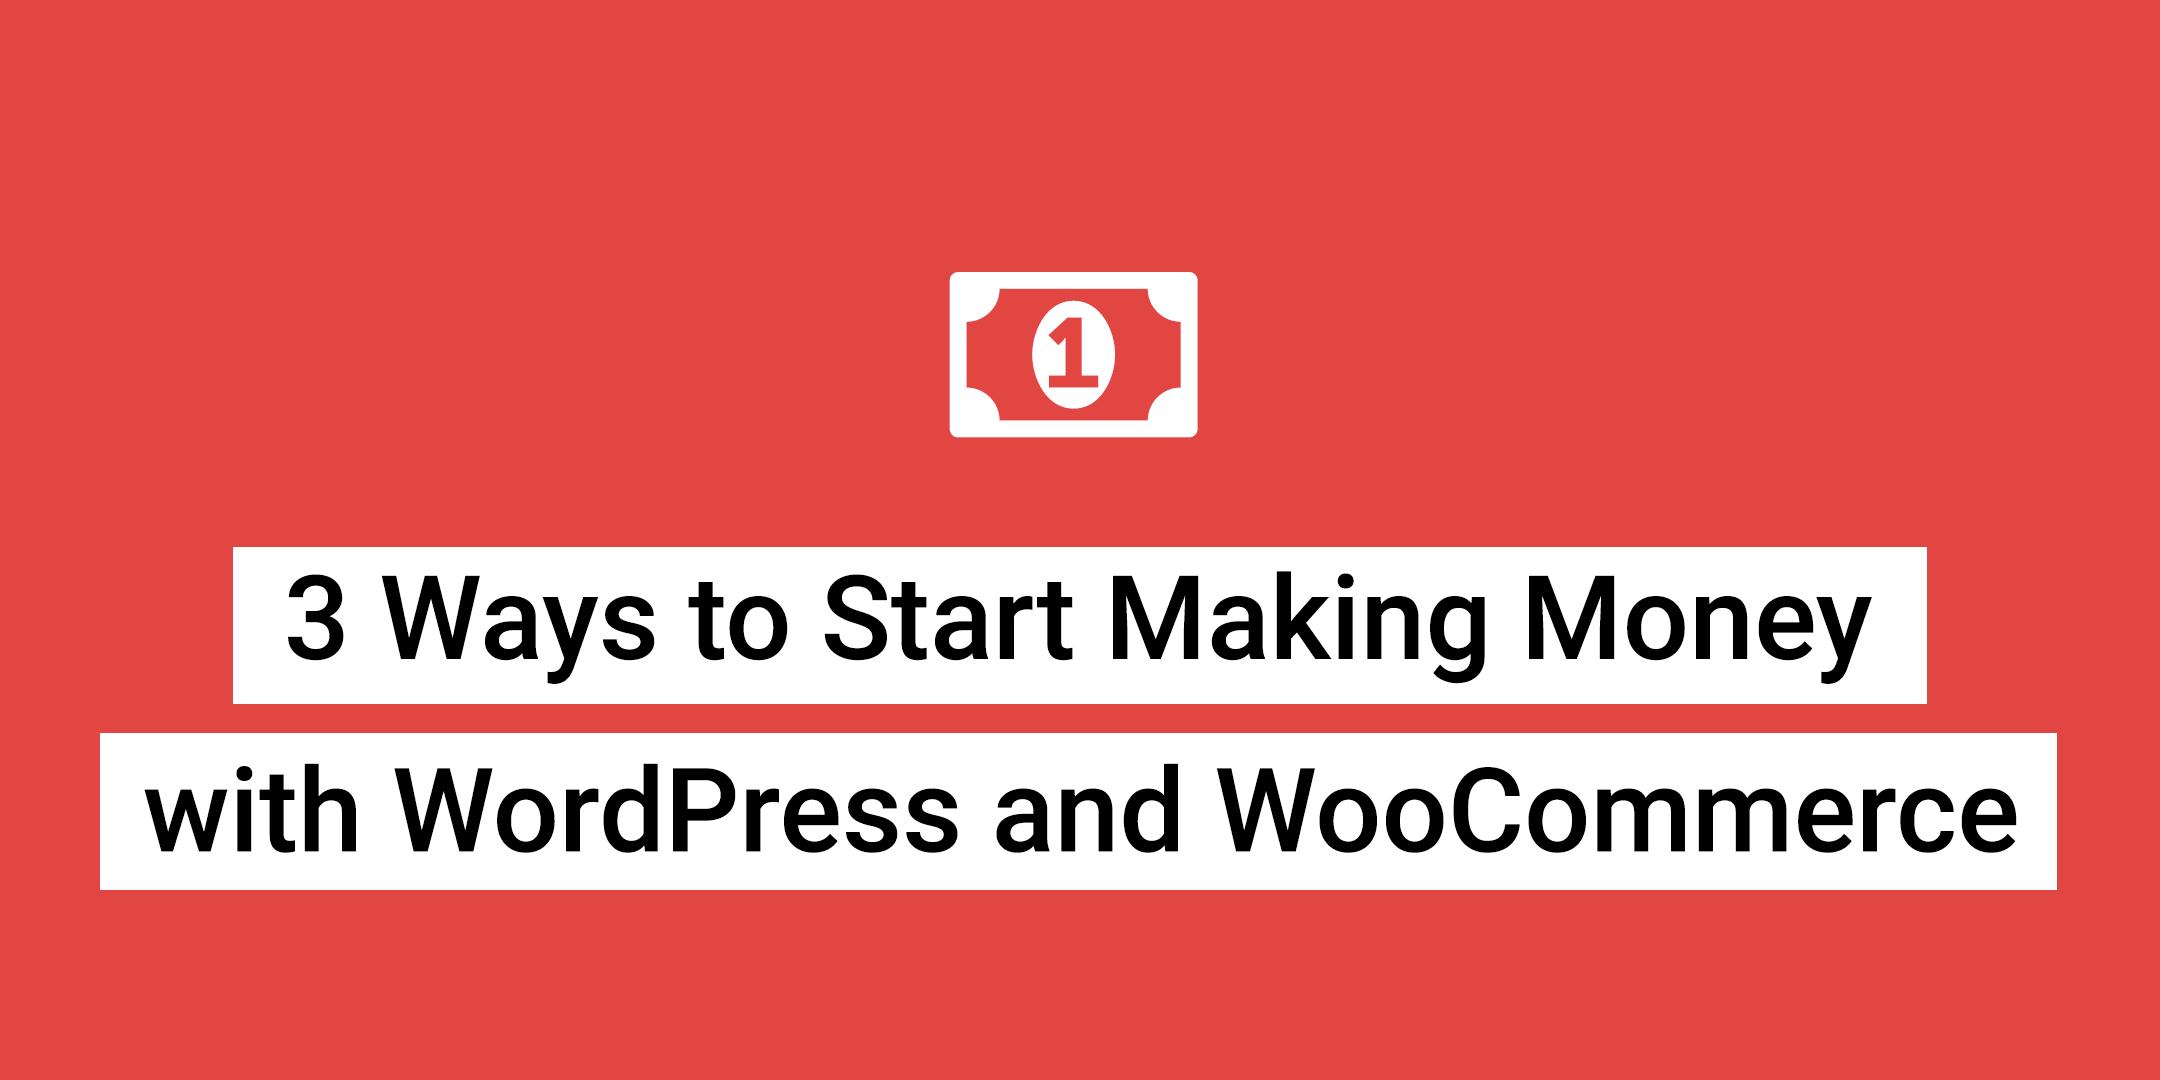 Make Money with WordPress and WooCommerce